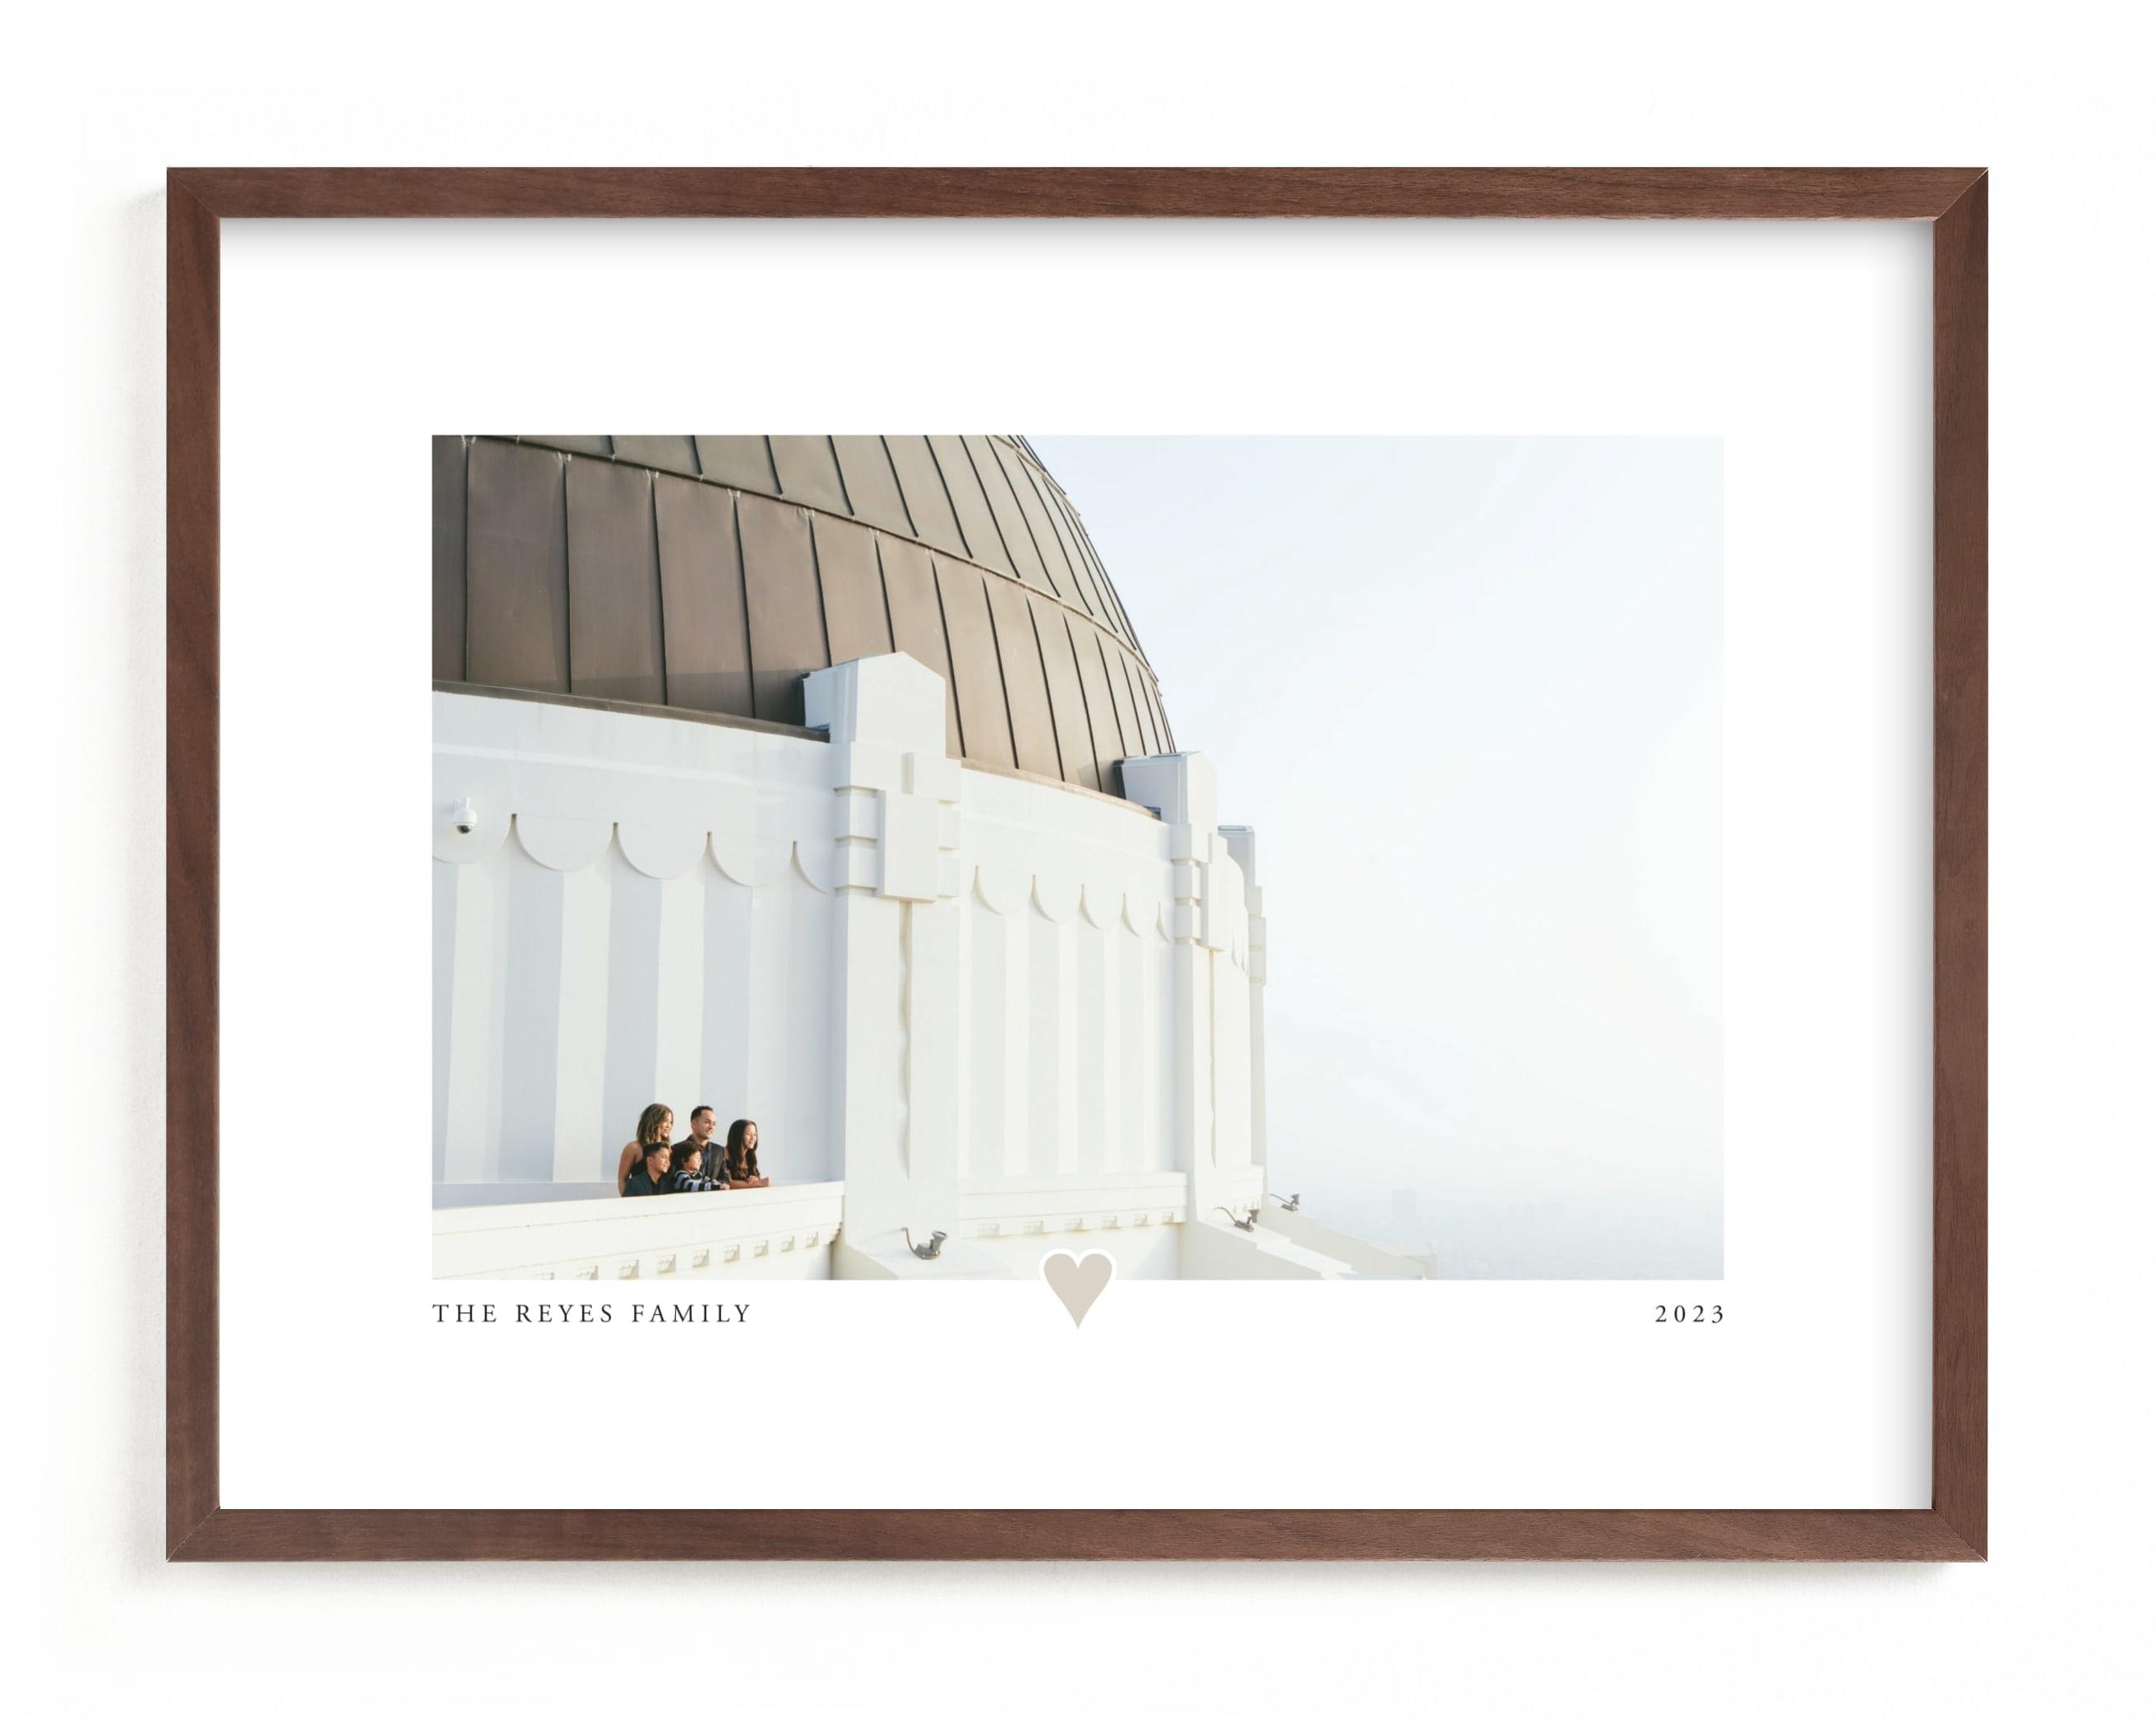 Best Mom Ever Foil Pressed Photo Art Print